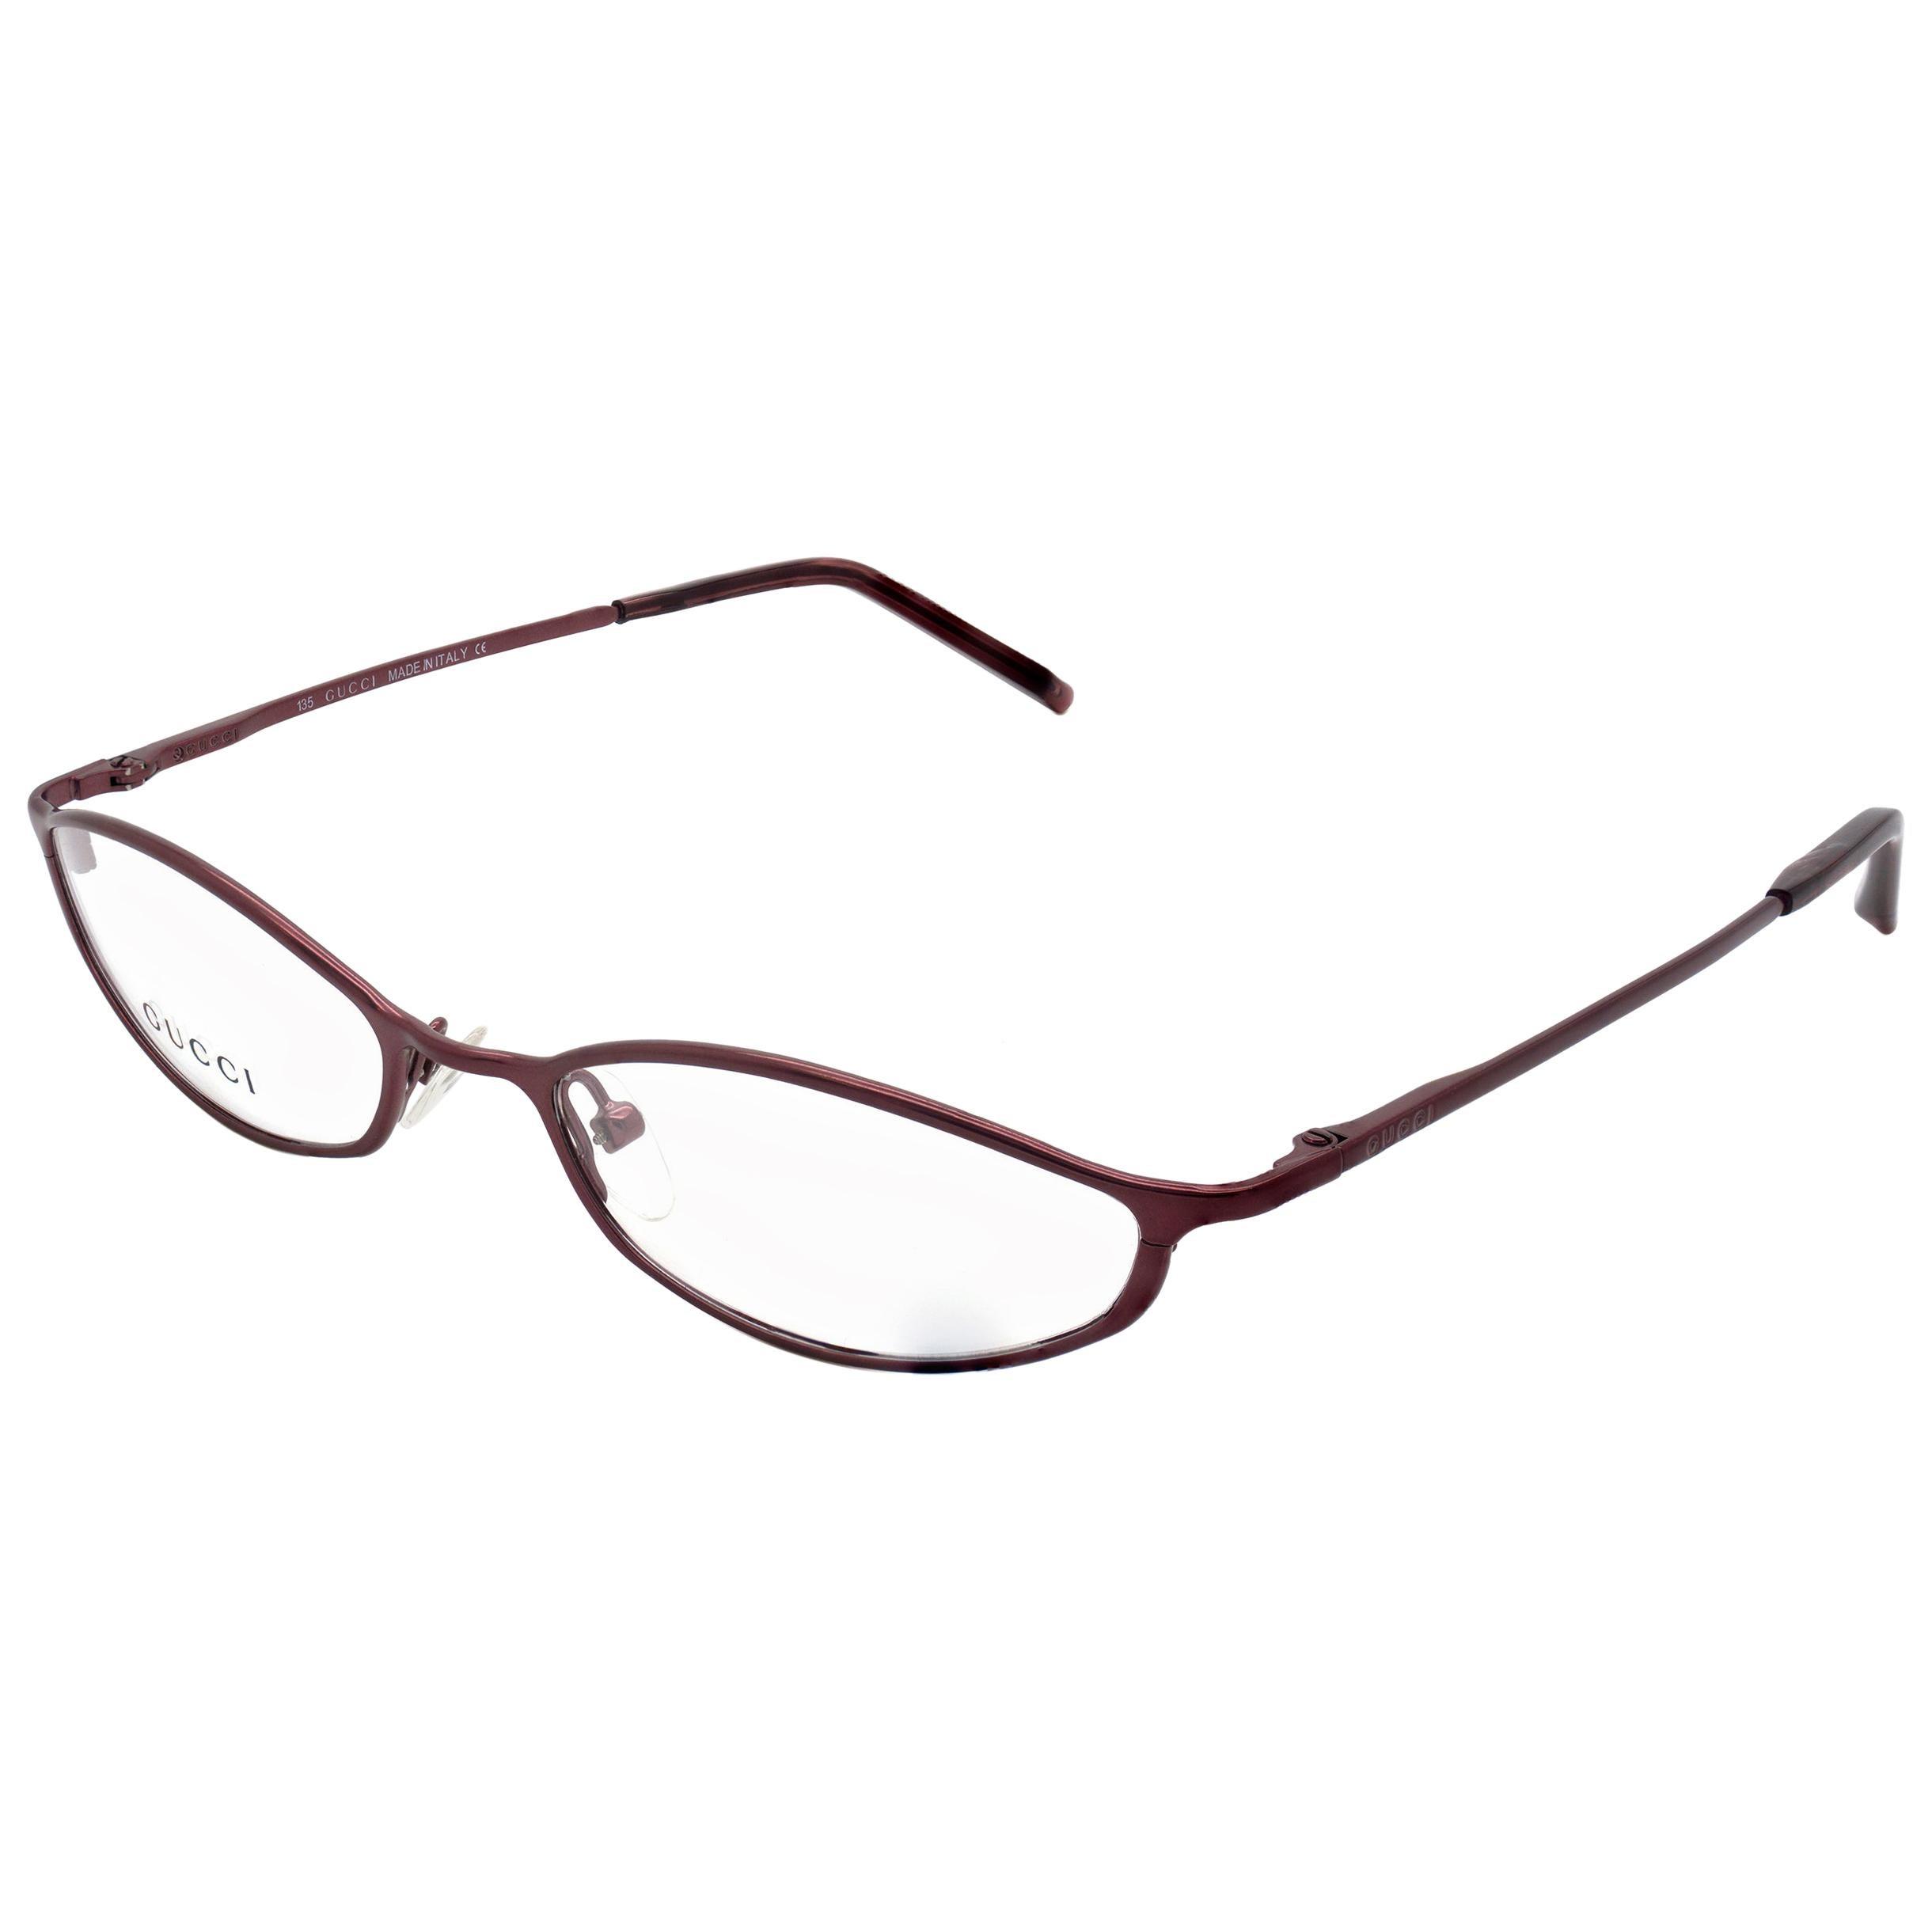 Vintage Gucci narrow glasses frame